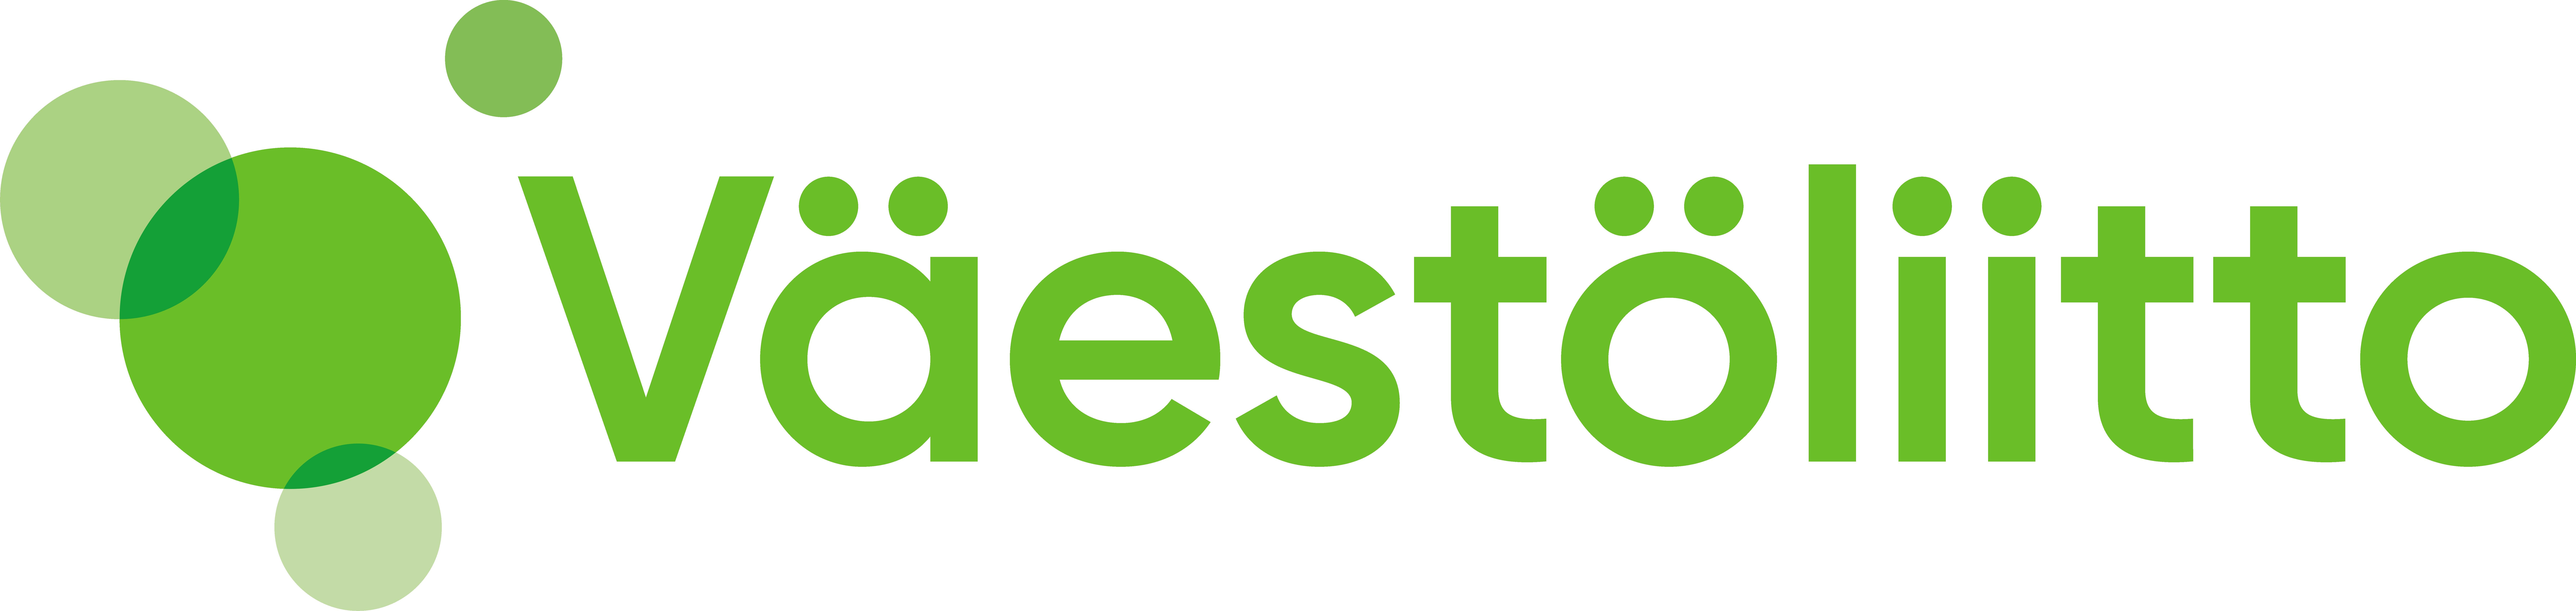 Väestöliitto ry:n logo